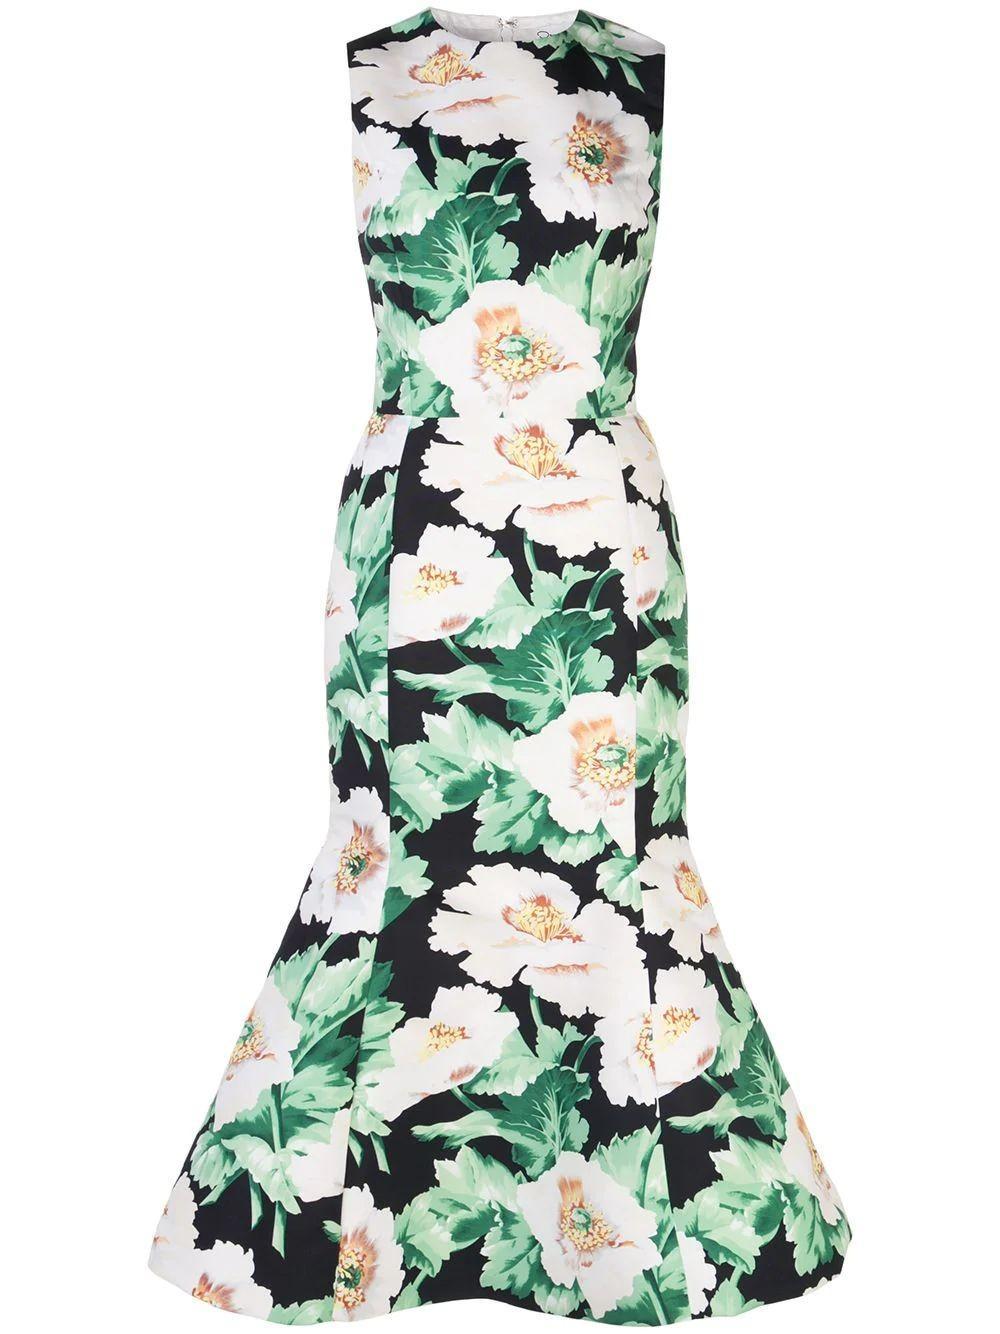 Floral Motif Cocktail Dress Item # 20PN650VPF